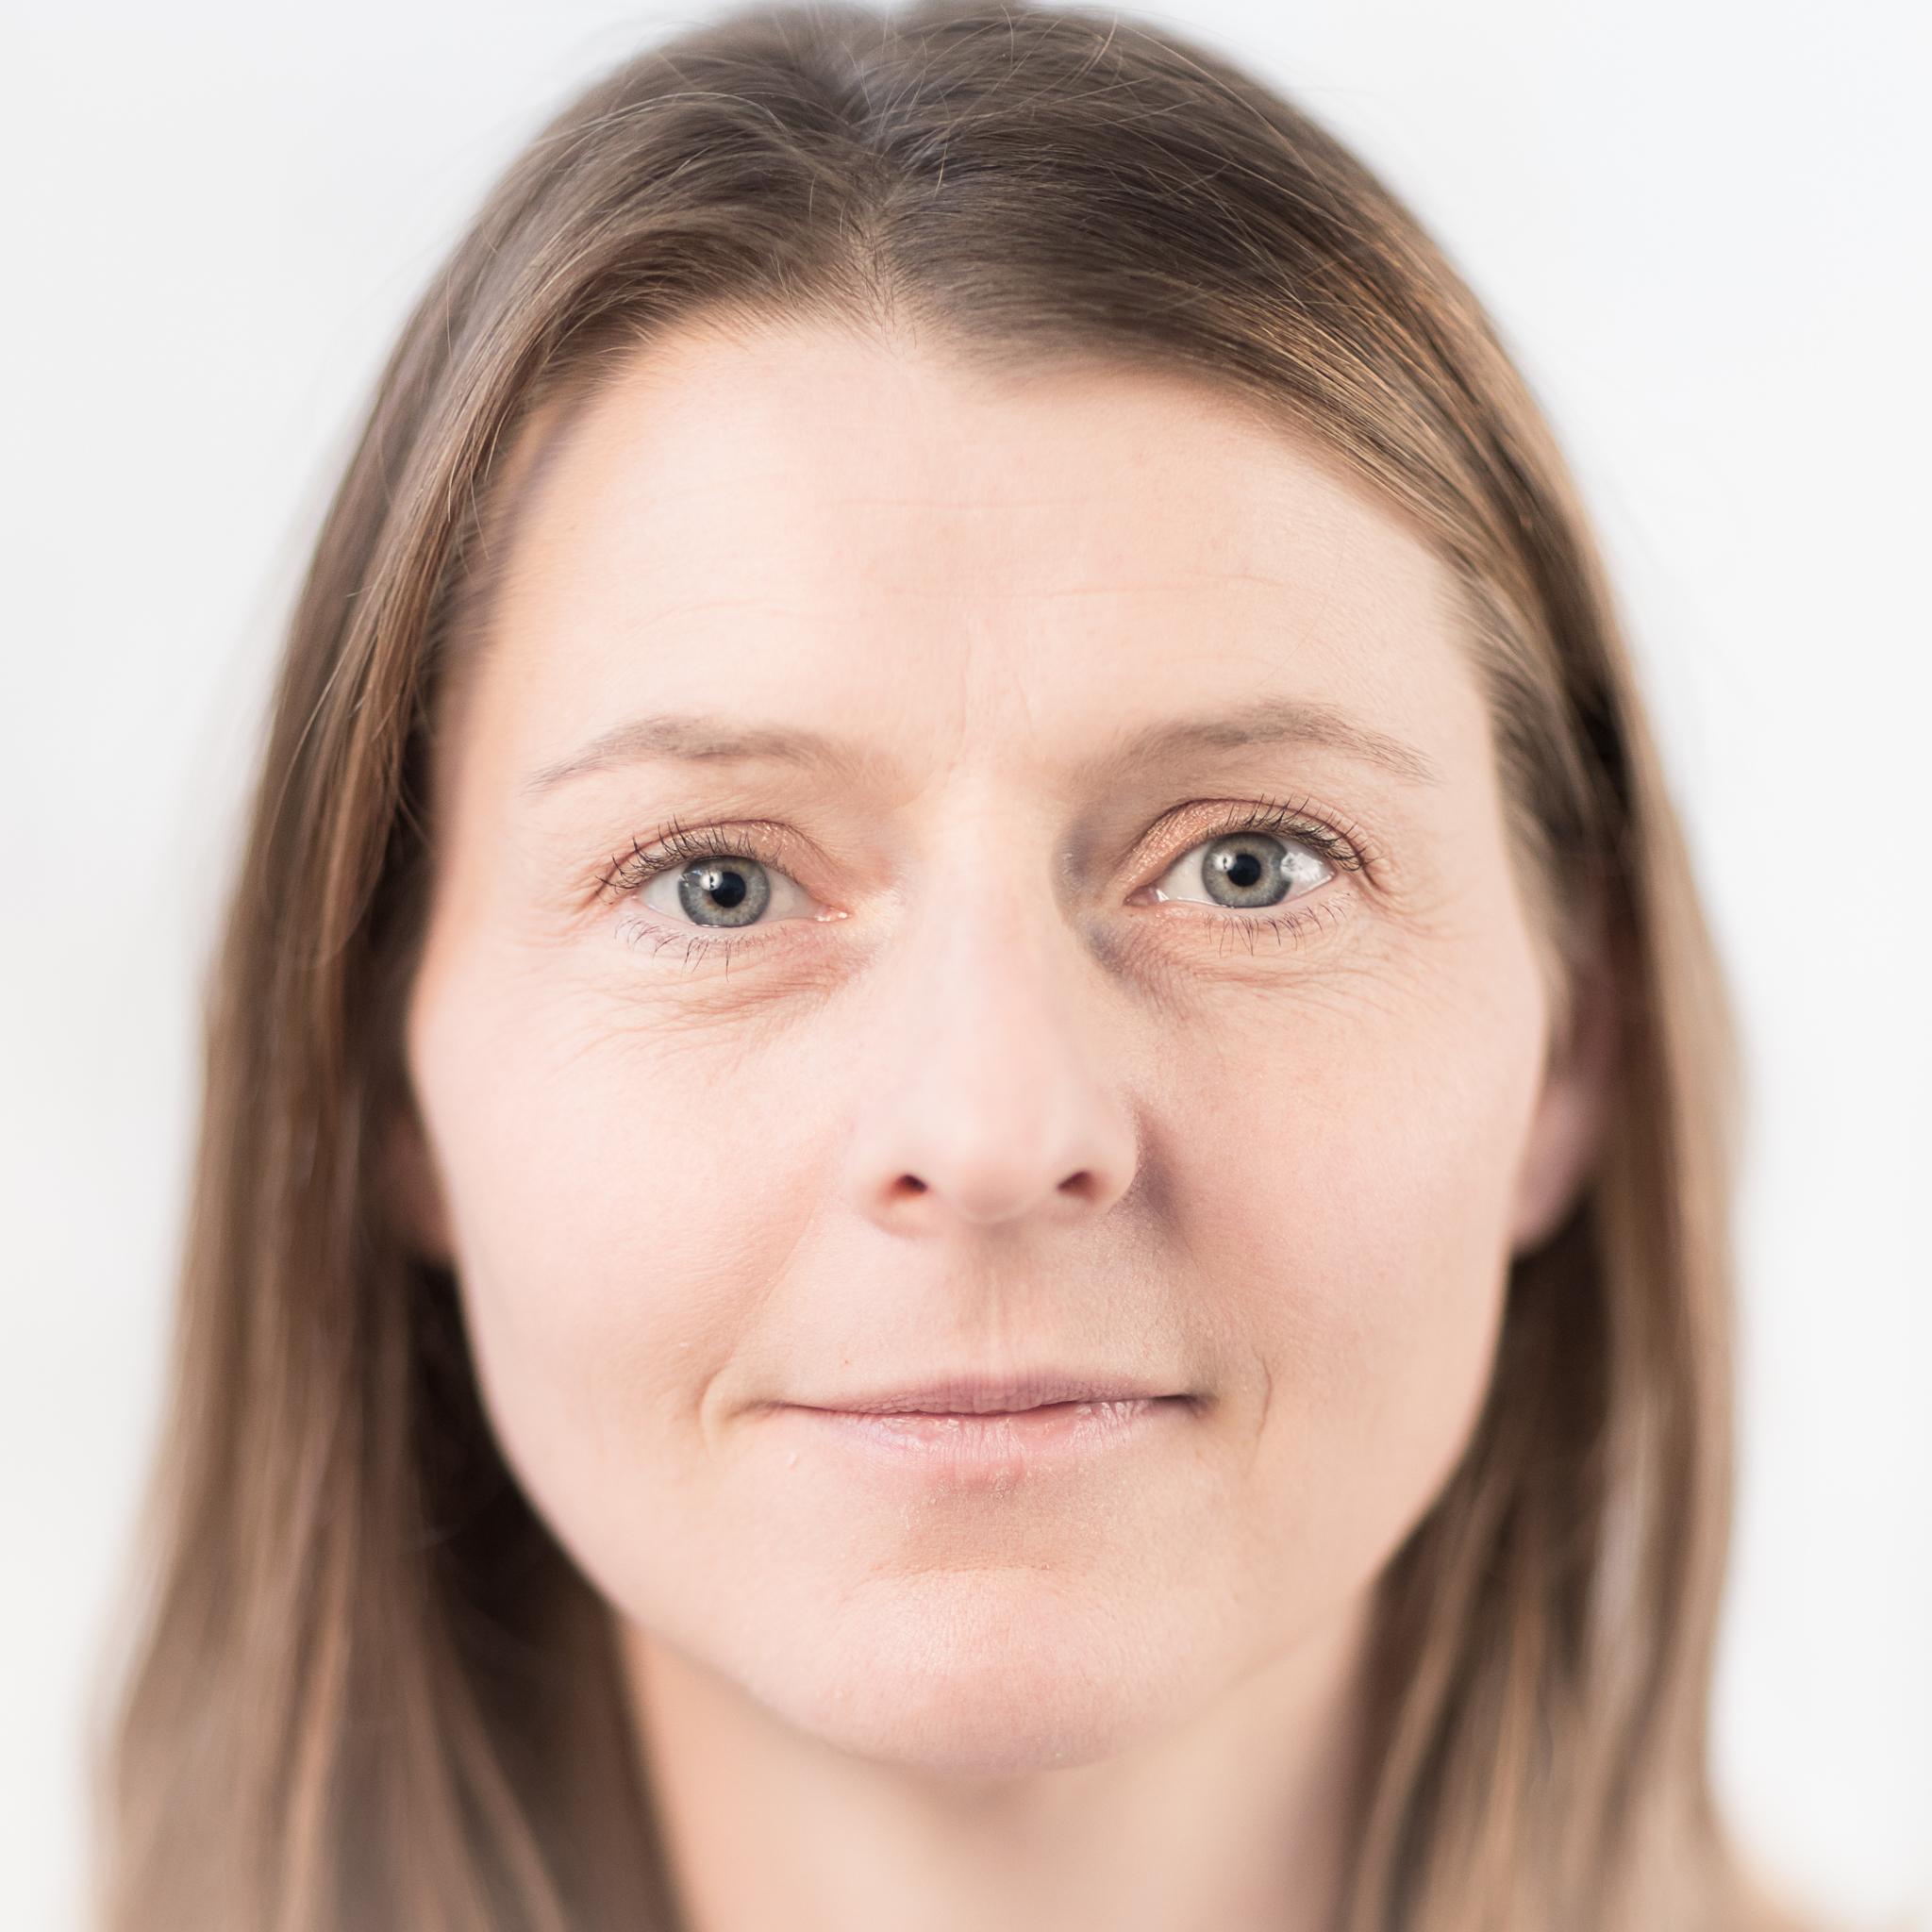 Karin Kopka-Musch